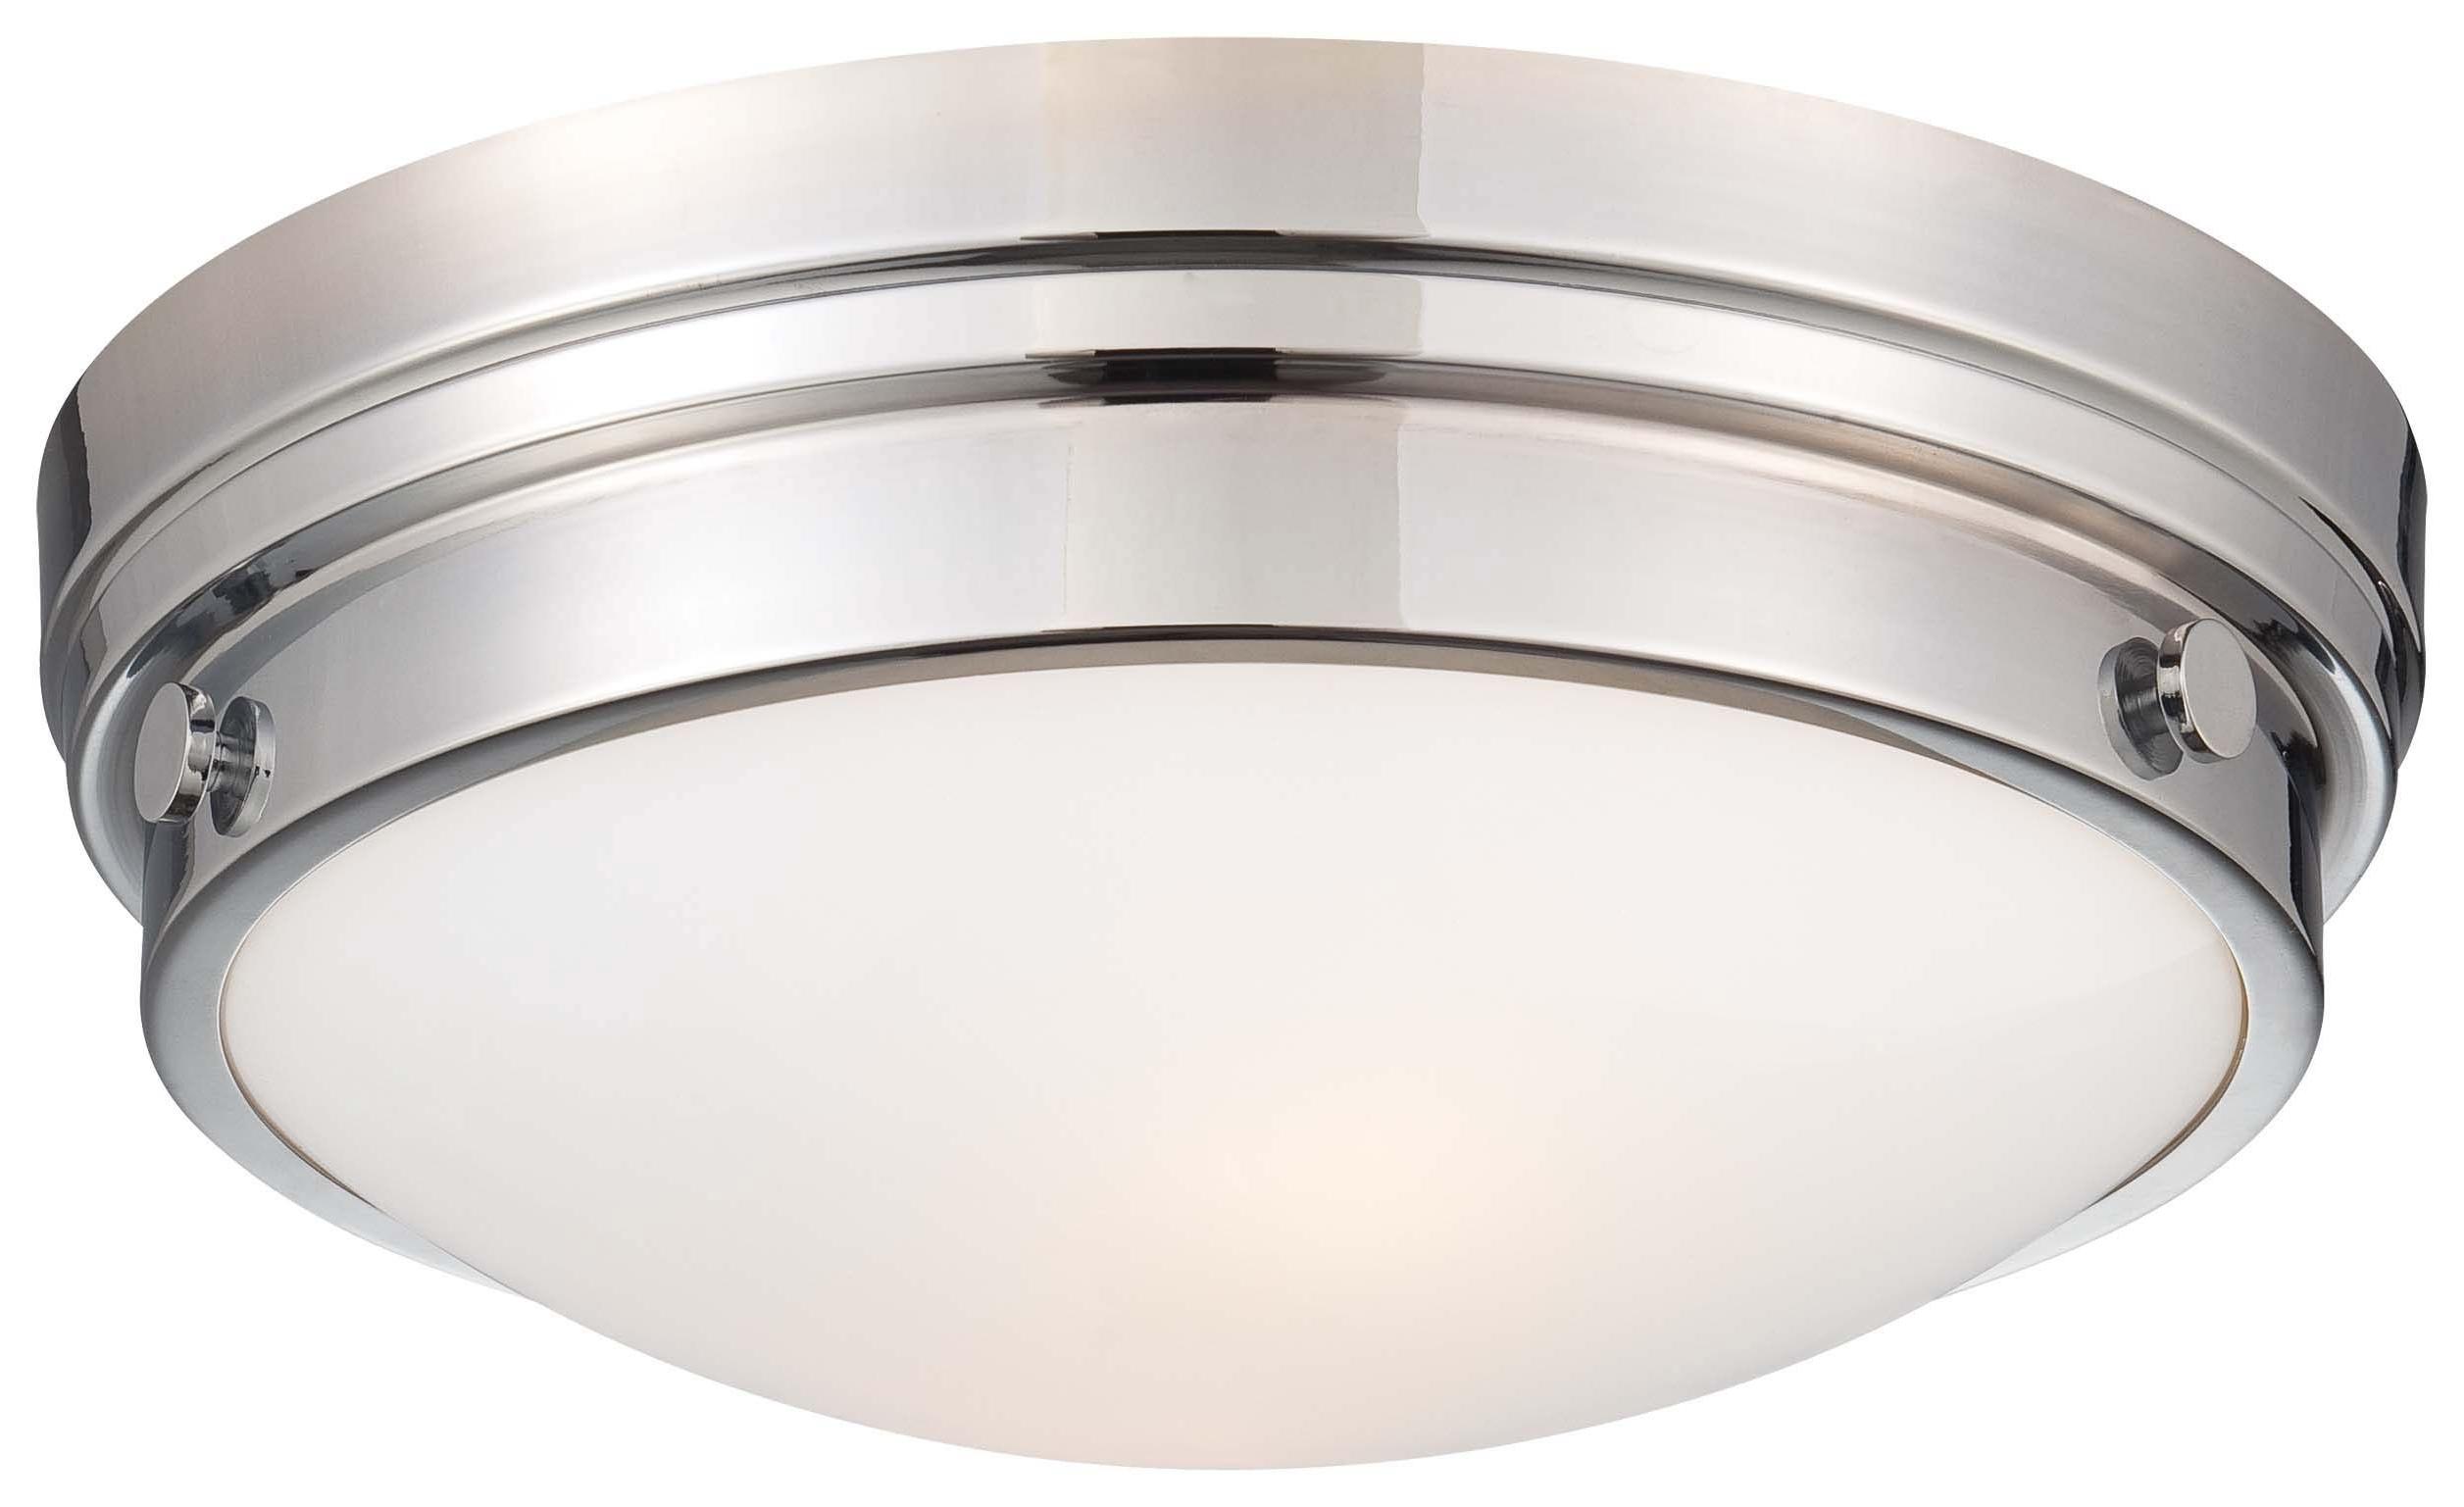 Outdoor Fluorescent Ceiling Lights Inside Most Recent Light : Best Kitchen Light Fixtures Dining Room Lighting For (View 15 of 20)